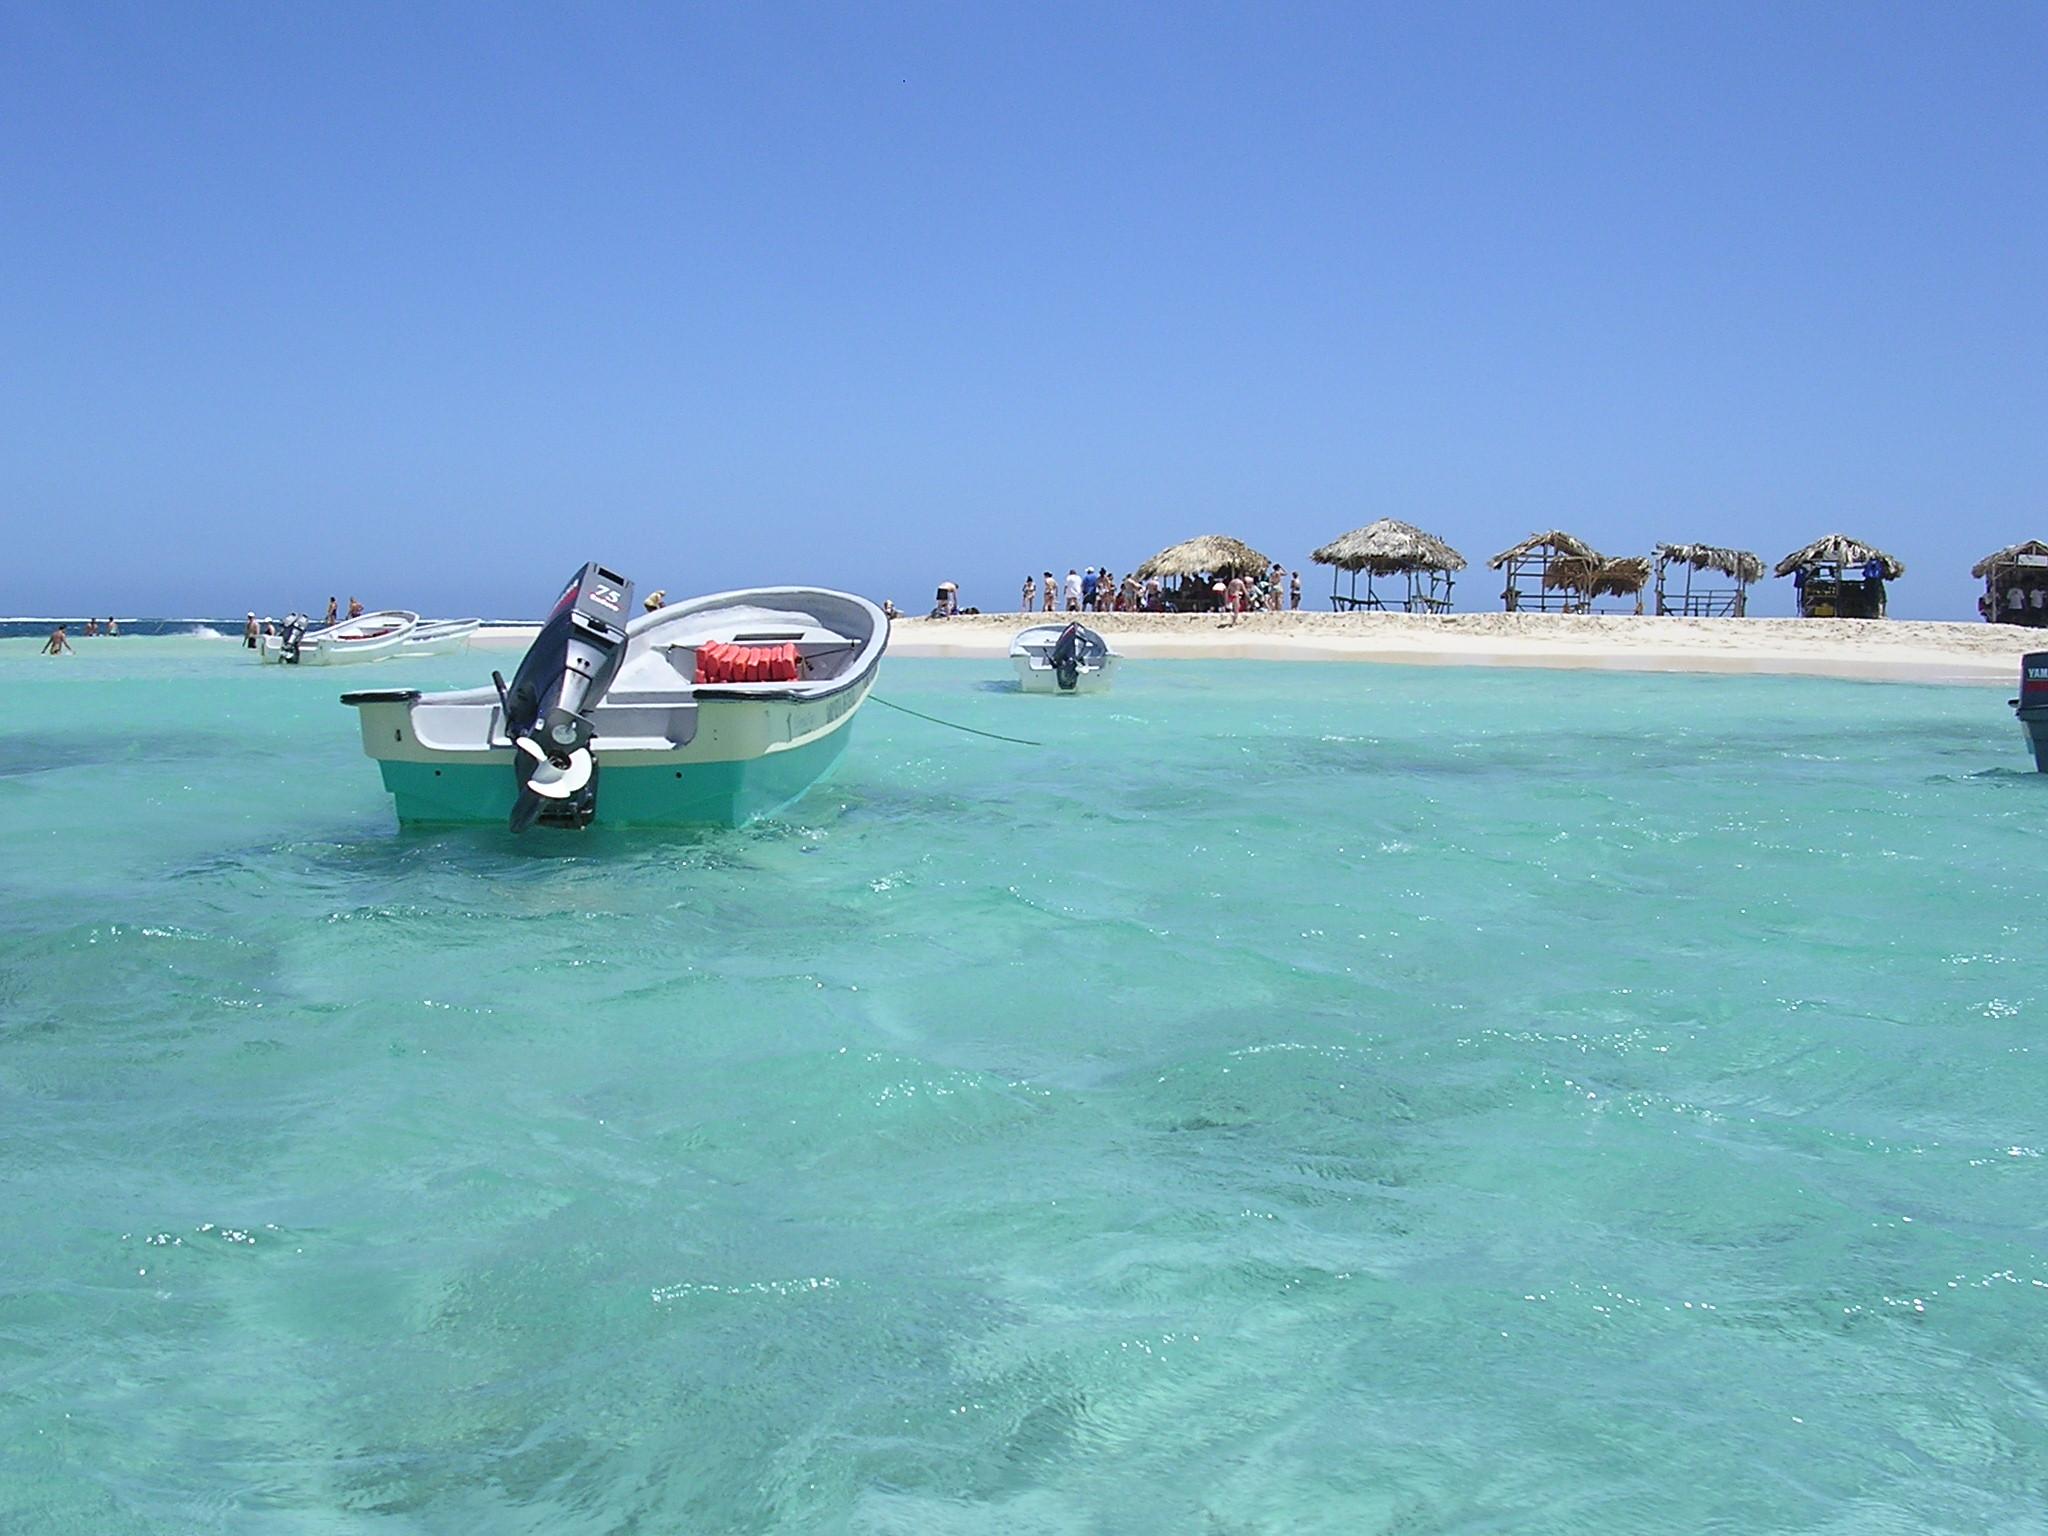 Dominicana de puerto plata 9